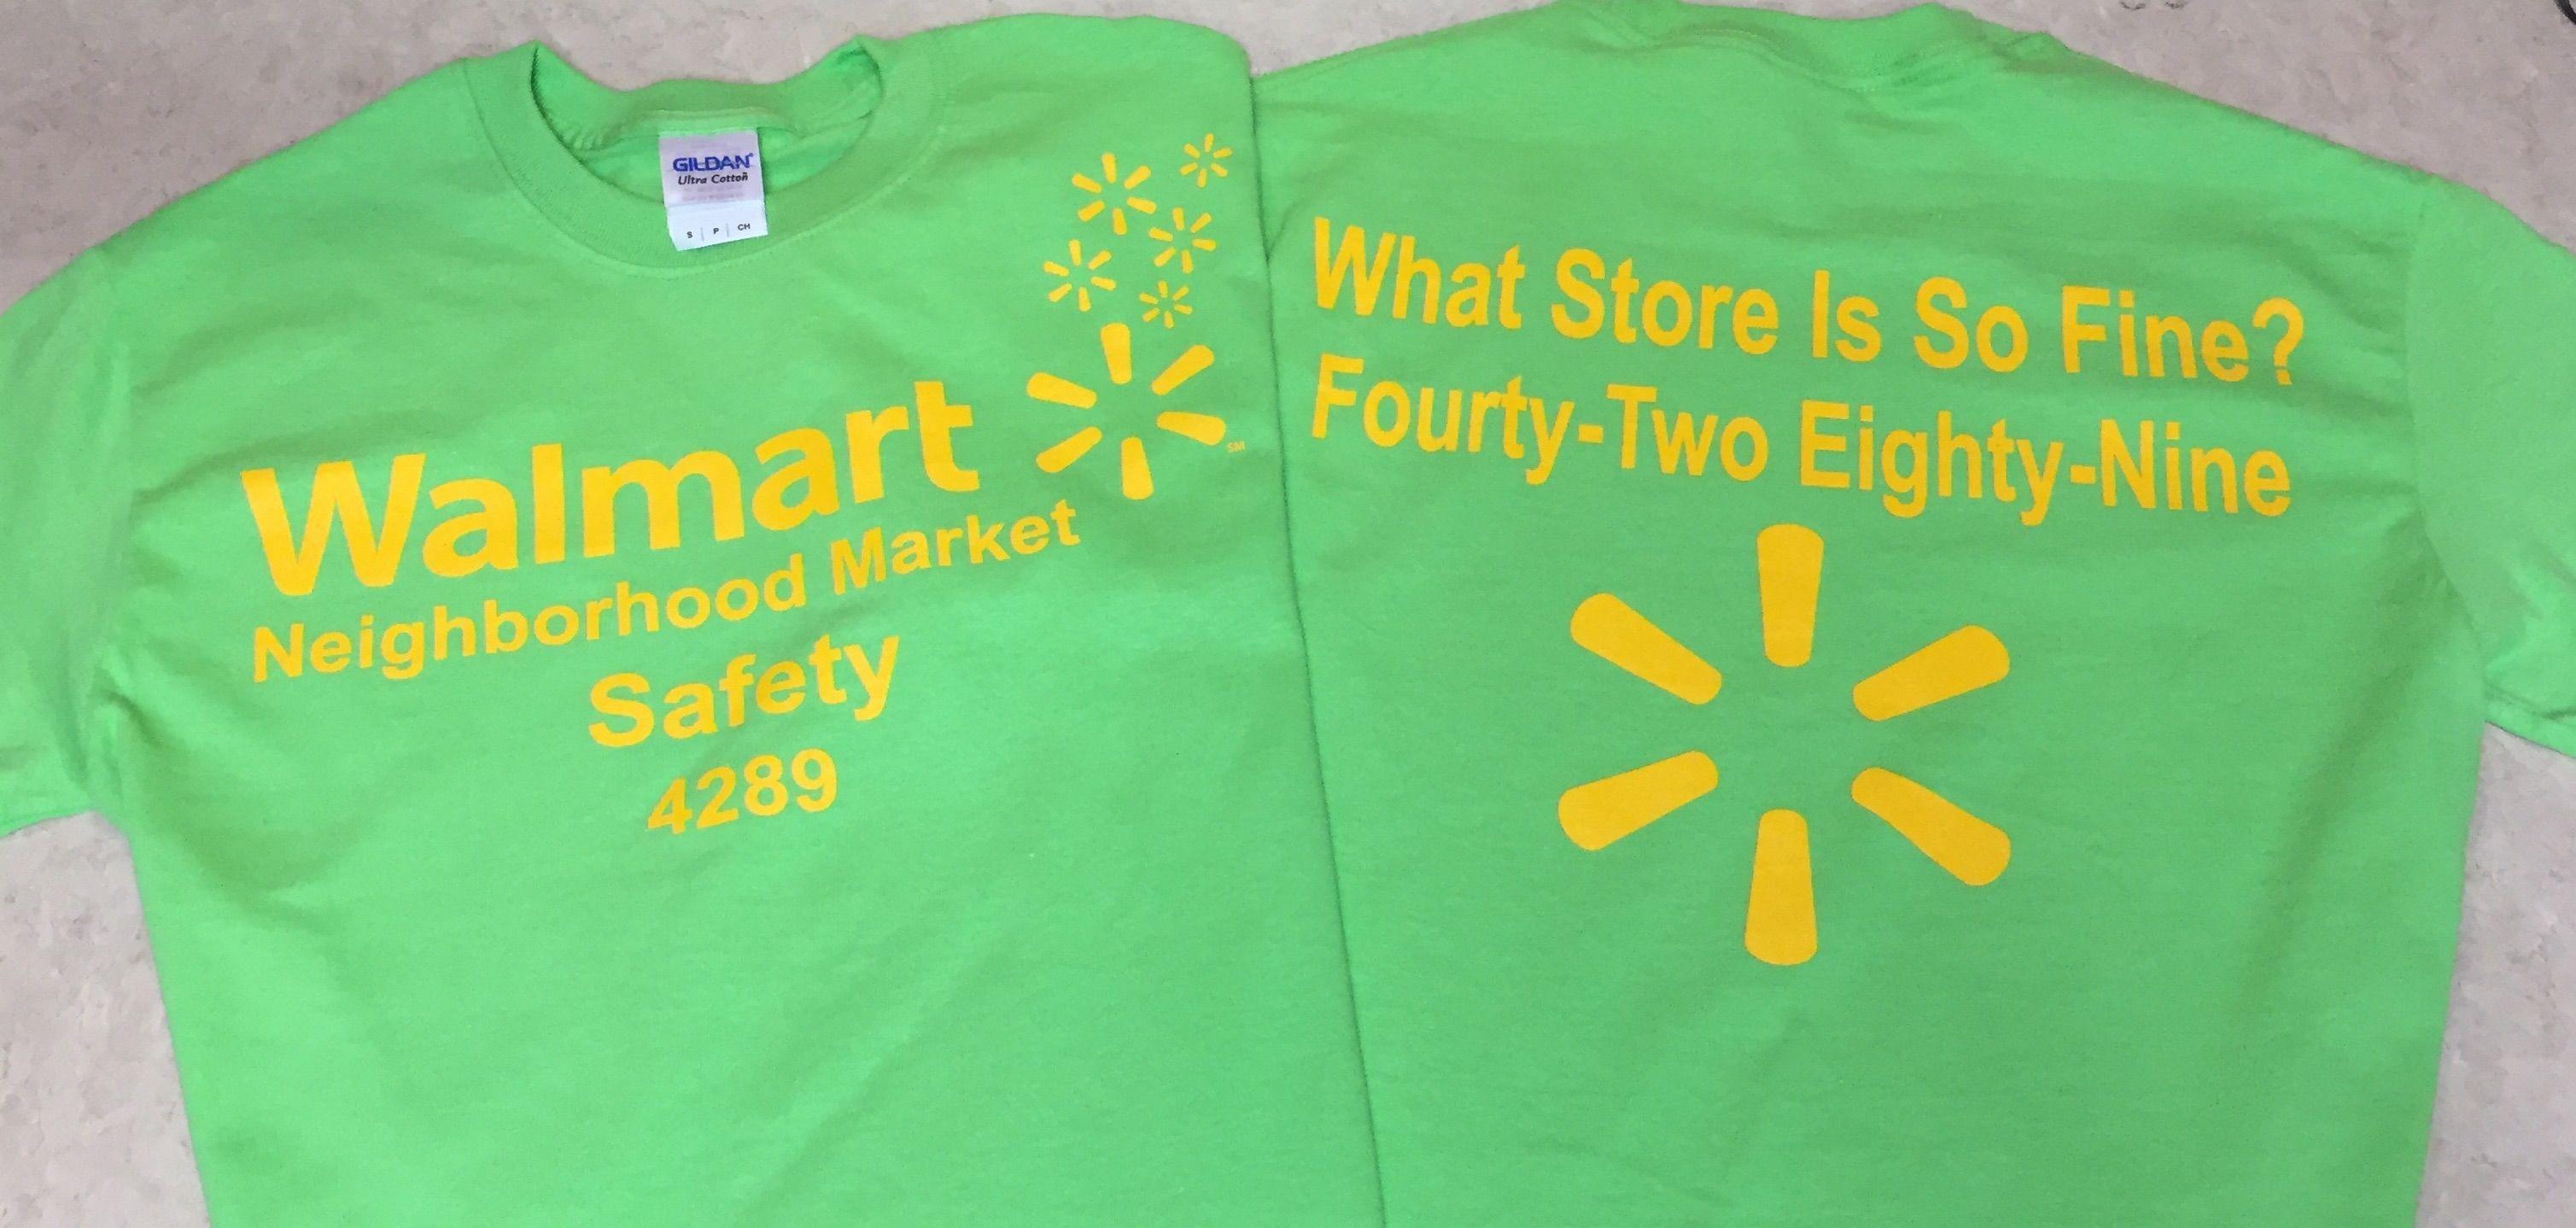 Walmart Neighborhood Market Safety